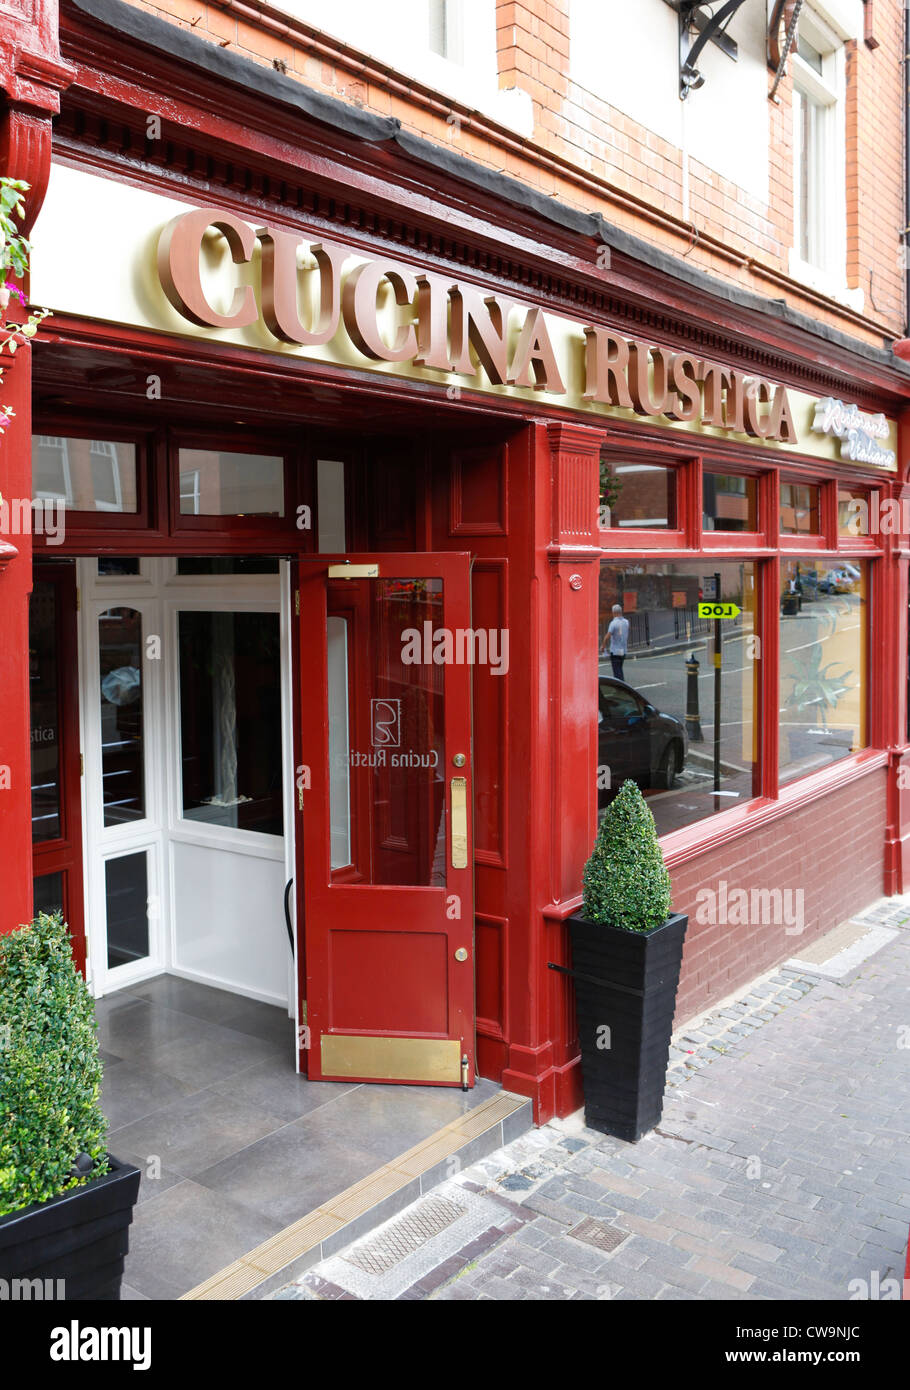 Interesting cucina rustica restaurant the jewellery